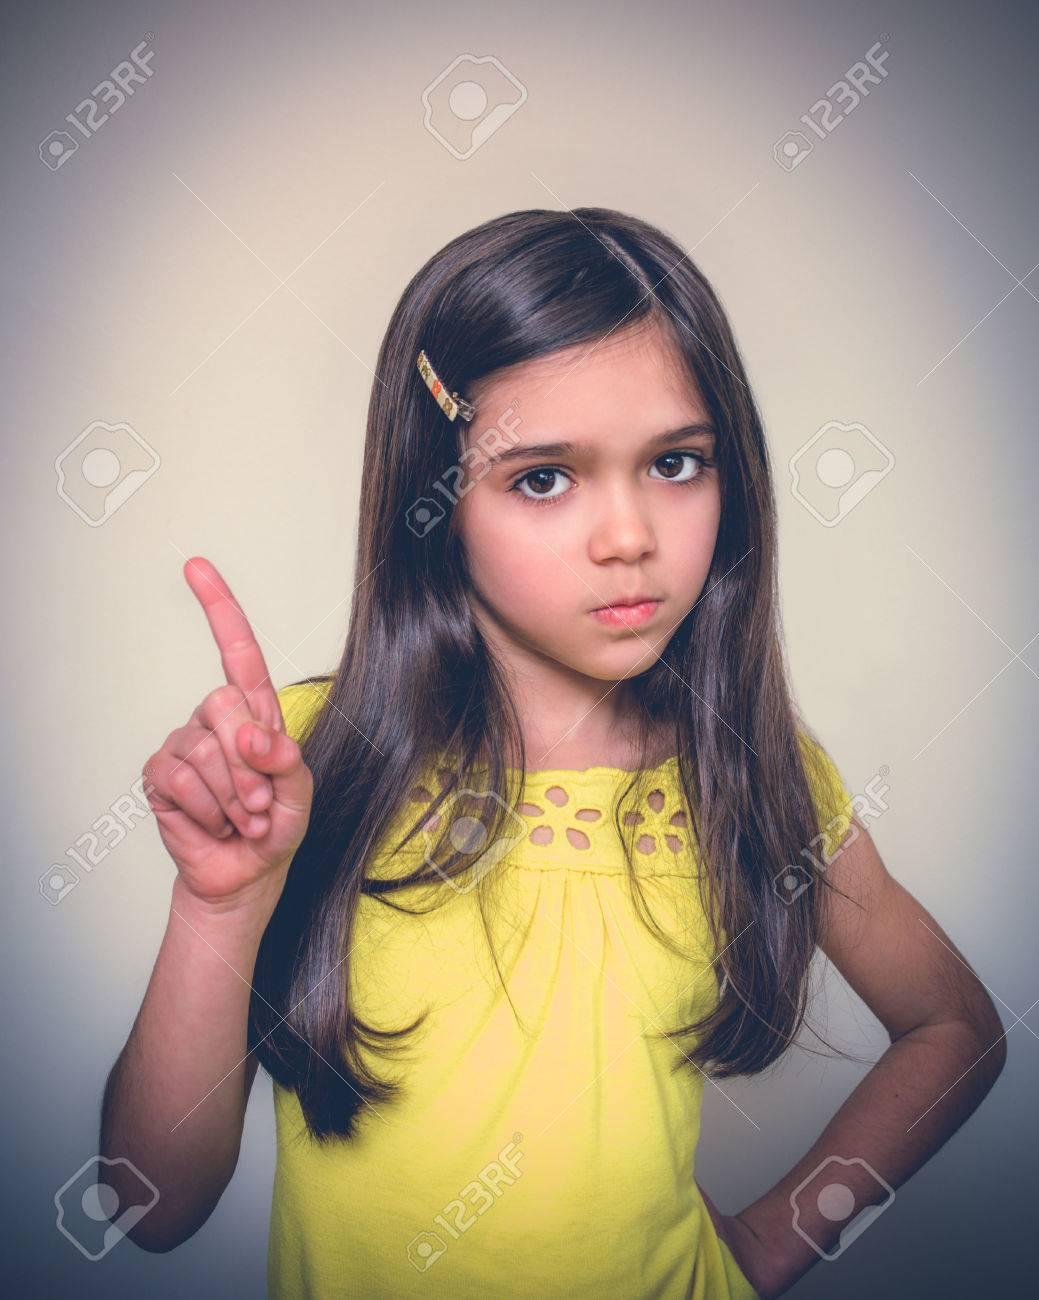 girls with attitude